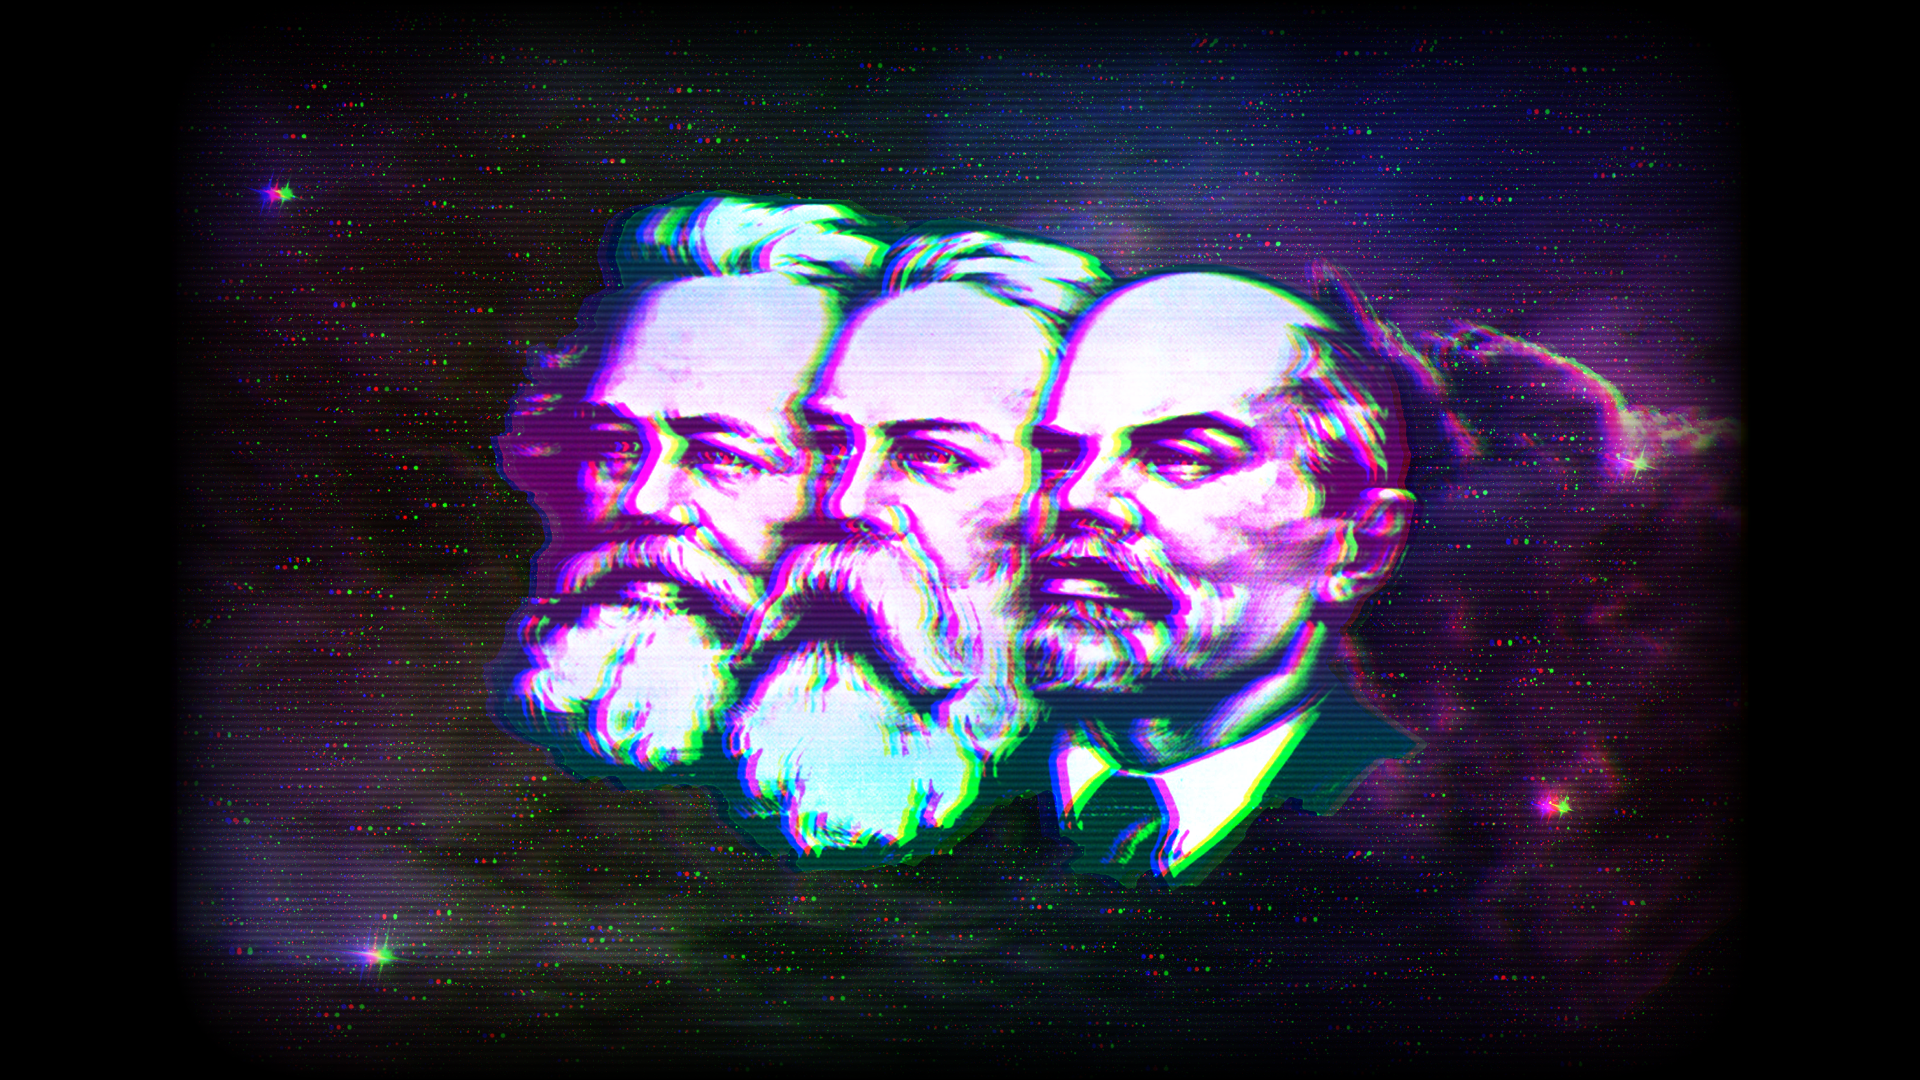 Marx Engels Lenin wallpaper original artwork at labourwave 1920x1080